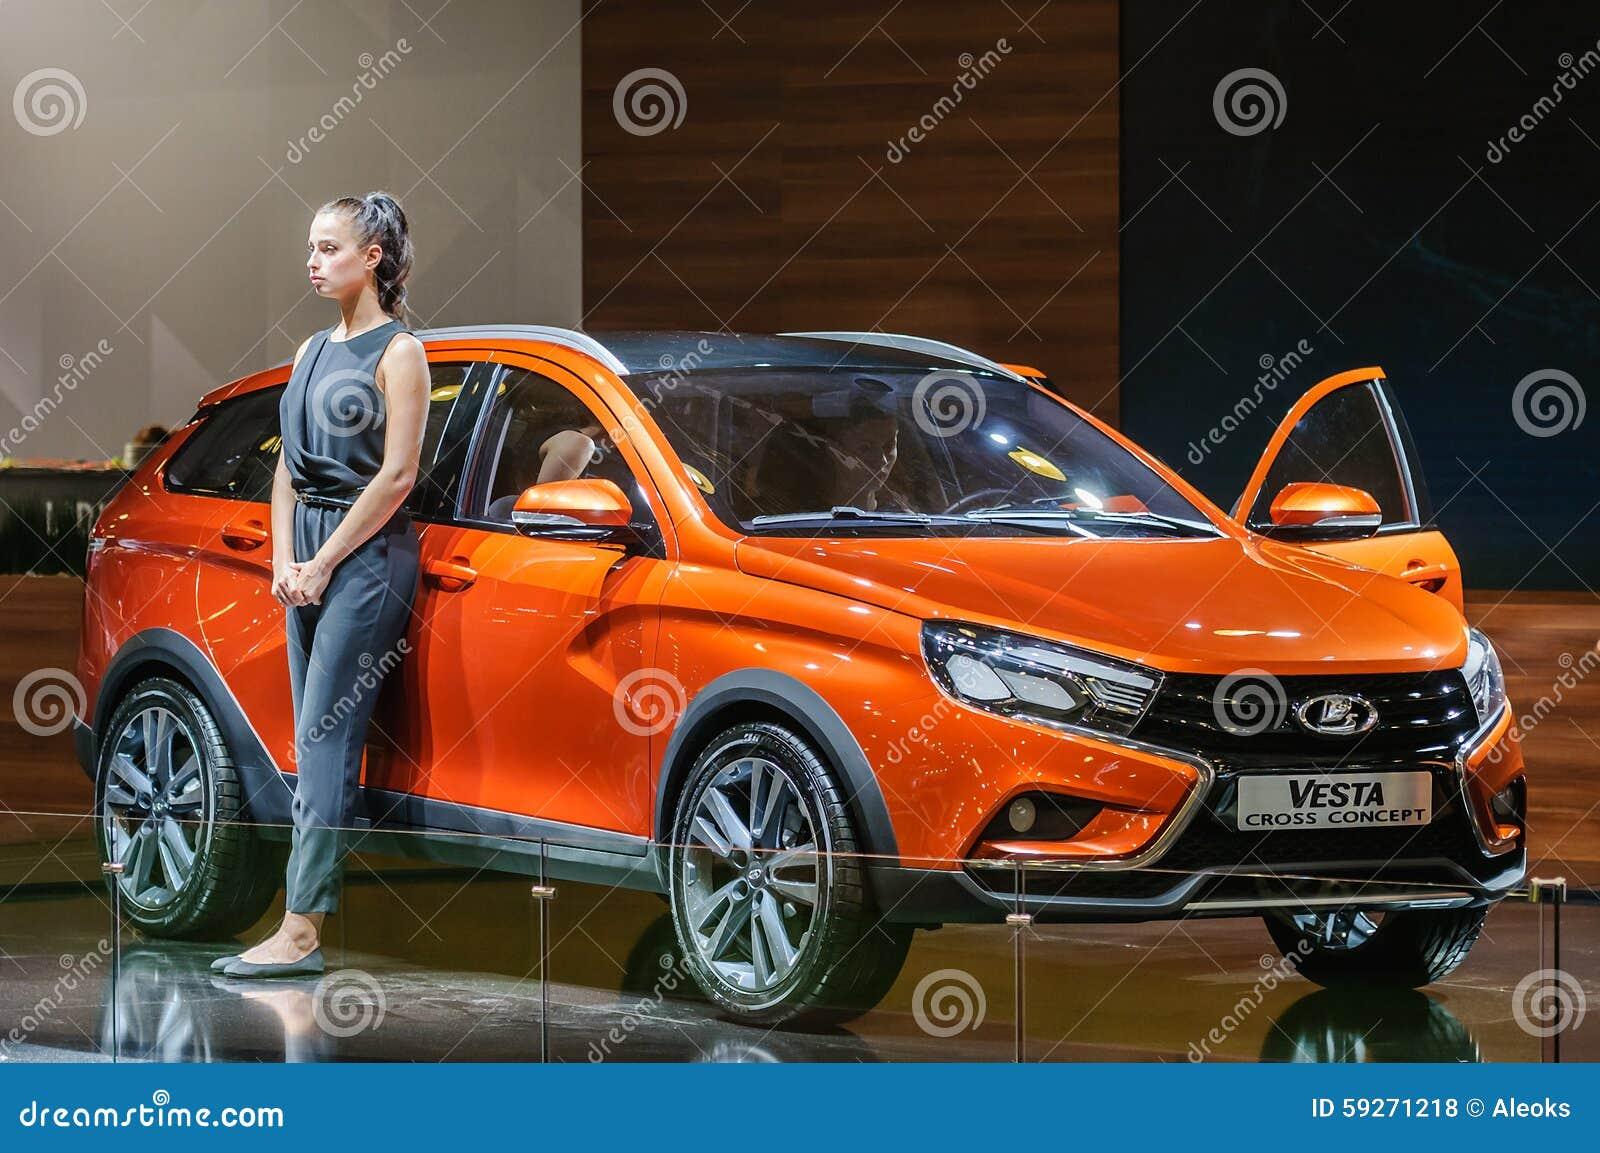 Crossover Lada Vesta Cross Concept Editorial Stock Photo ...